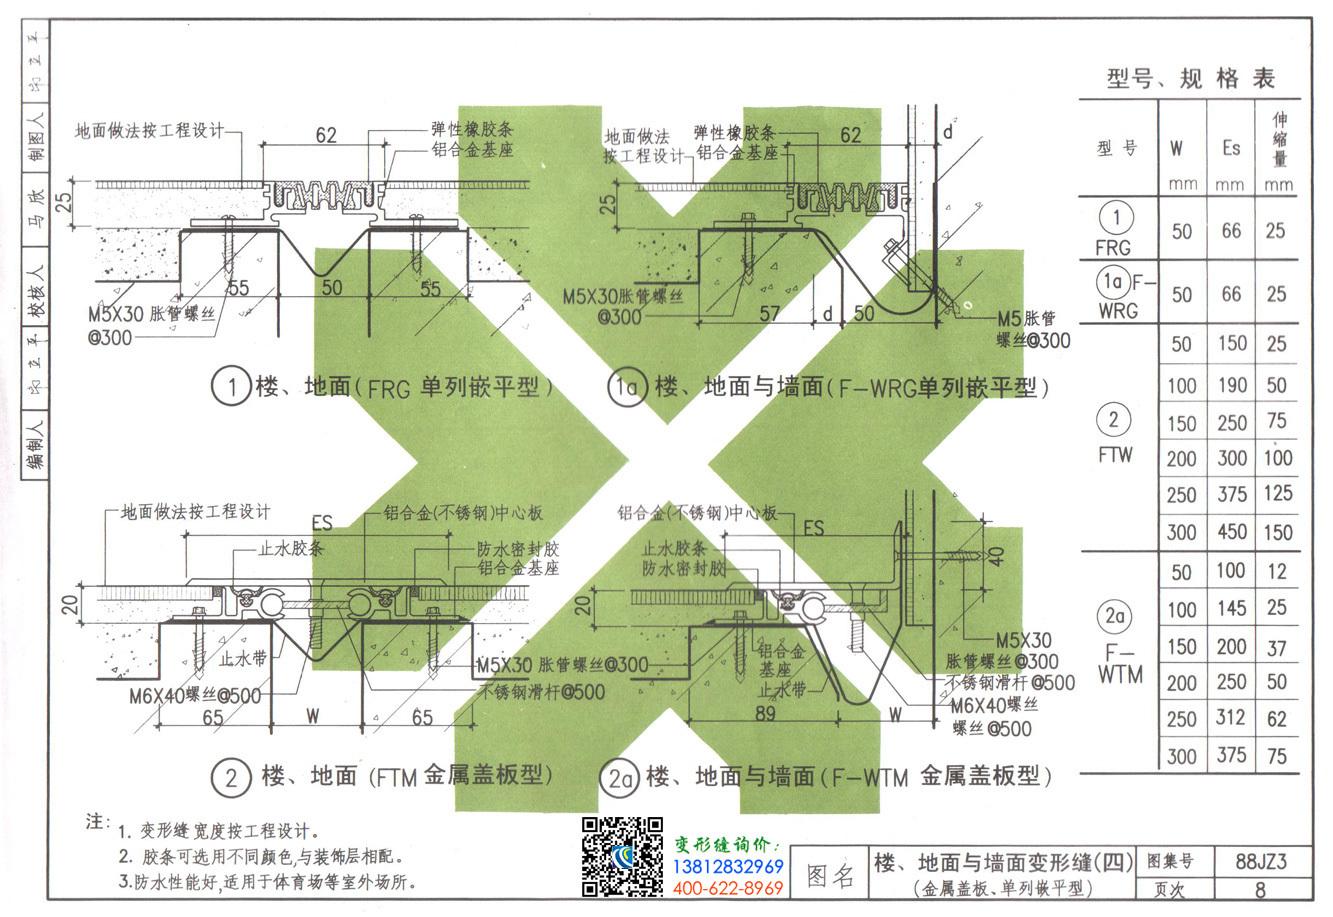 88JZ3变形缝图集第8页